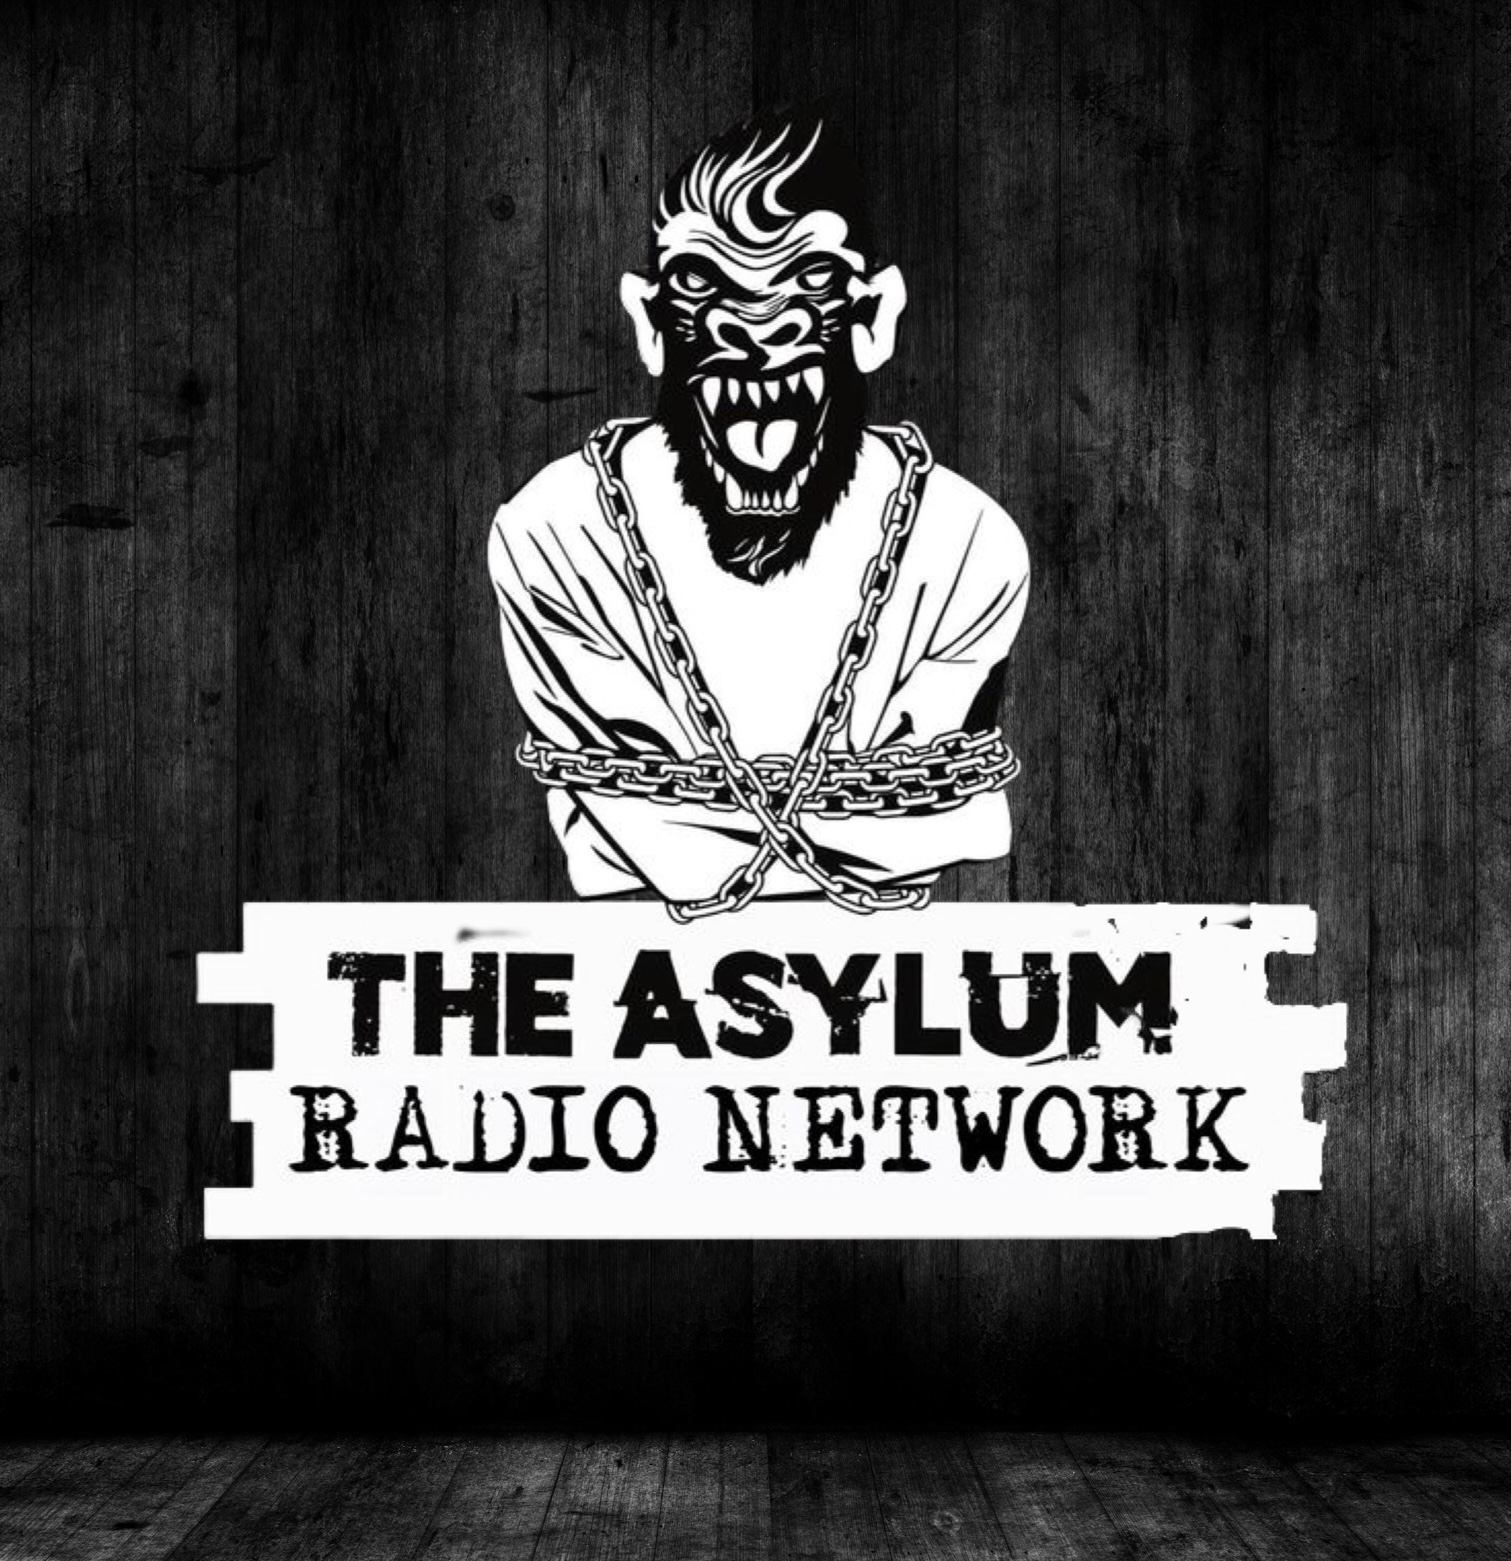 The Asylum Radio Network logo